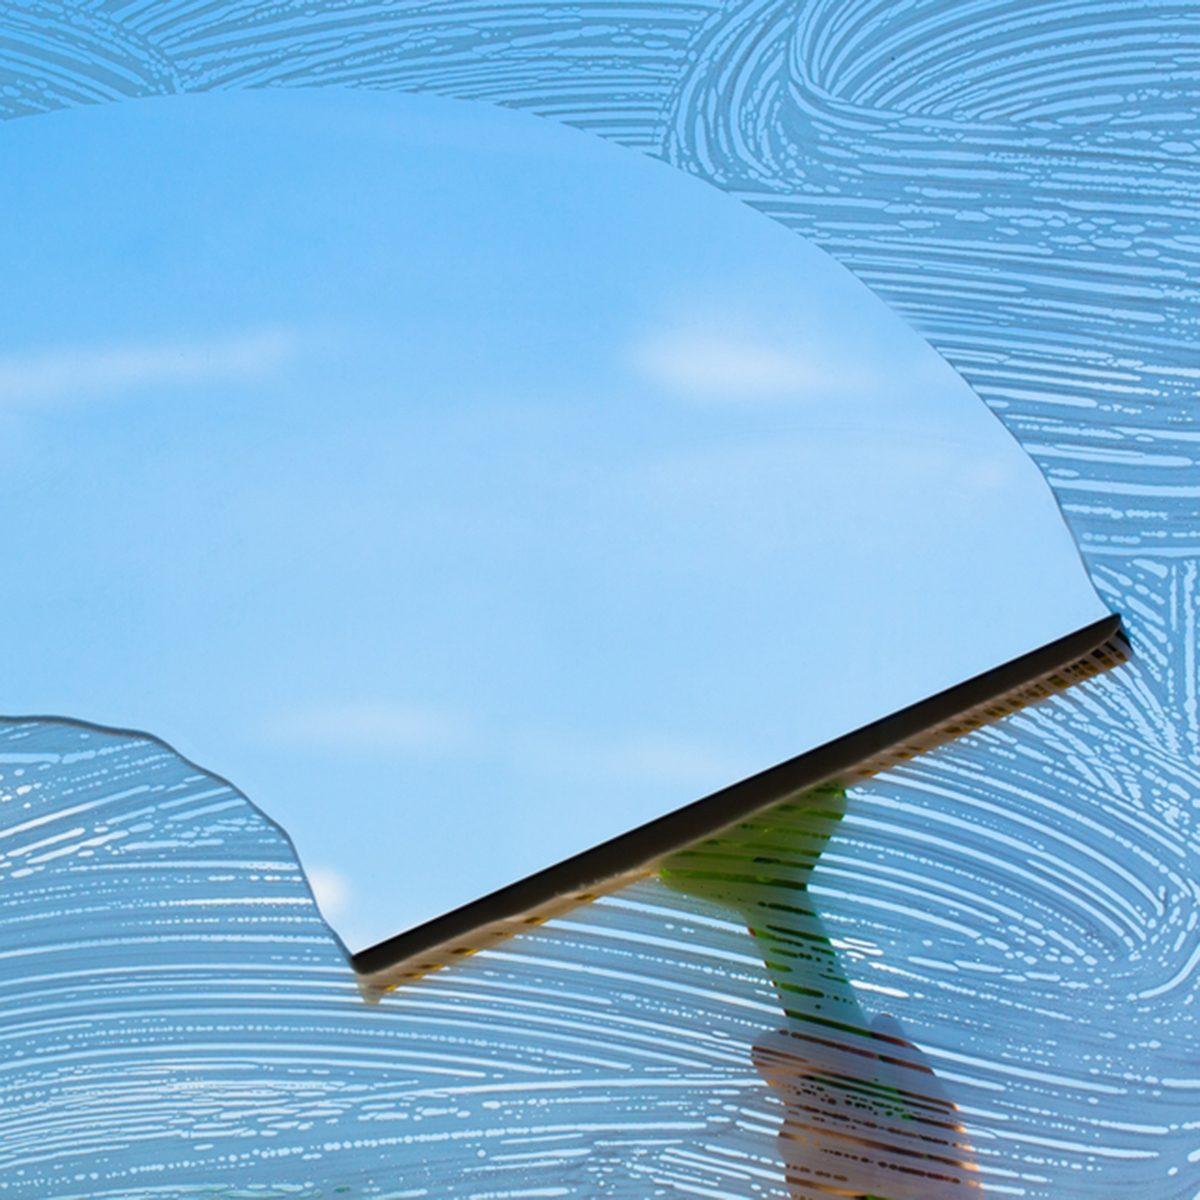 Window, Cleaning, Window Washer.; Shutterstock ID 274578671; Job (TFH, TOH, RD, BNB, CWM, CM): TOH